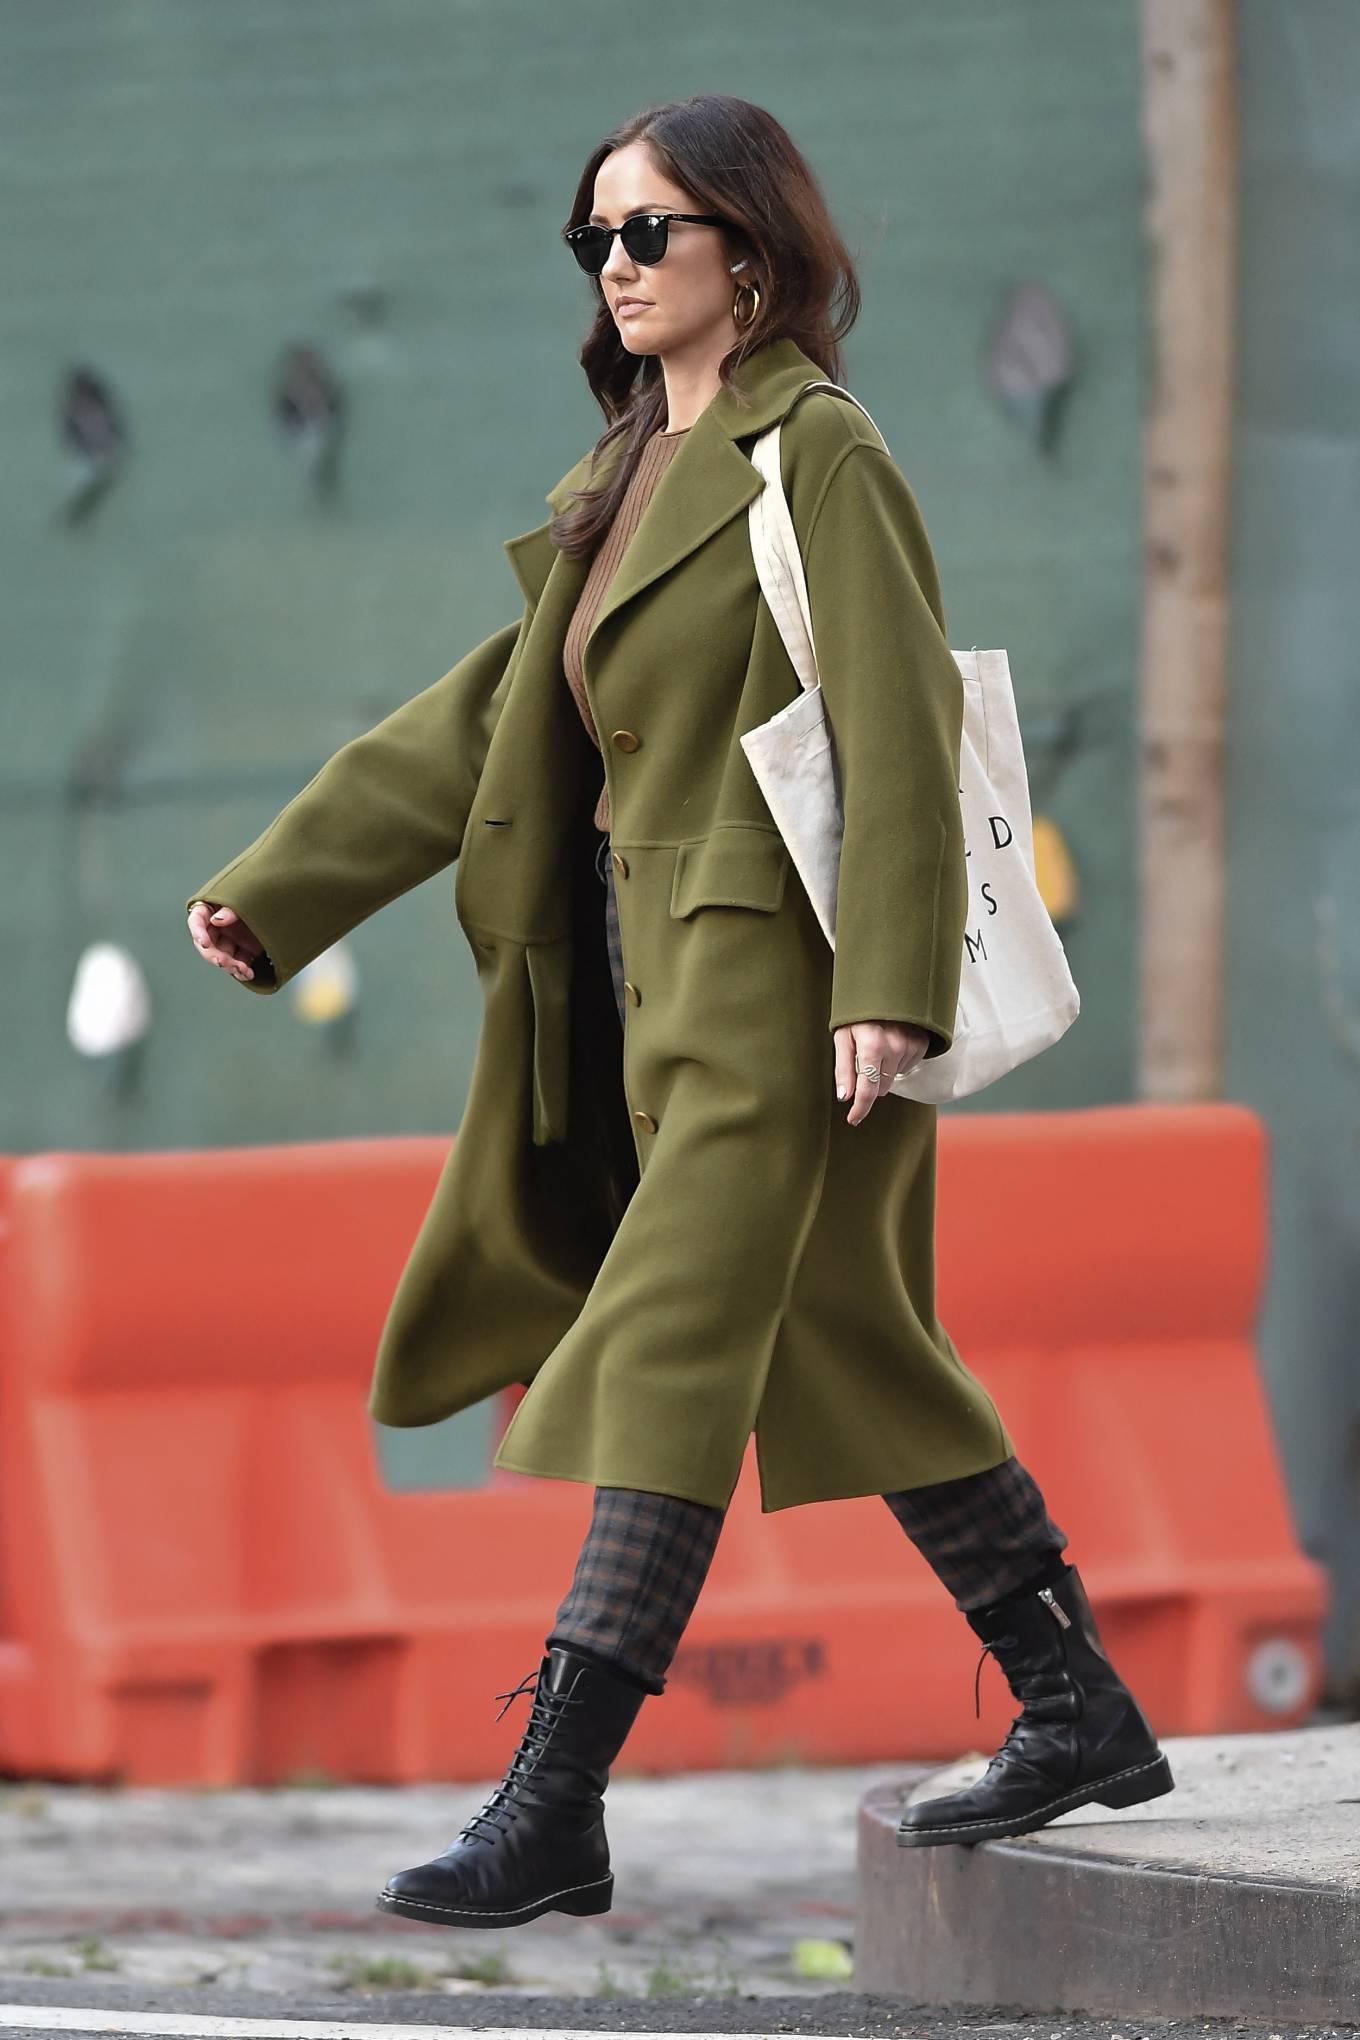 Minka Kelly 2021 : Minka Kelly – In olive green runs errands in New York-03